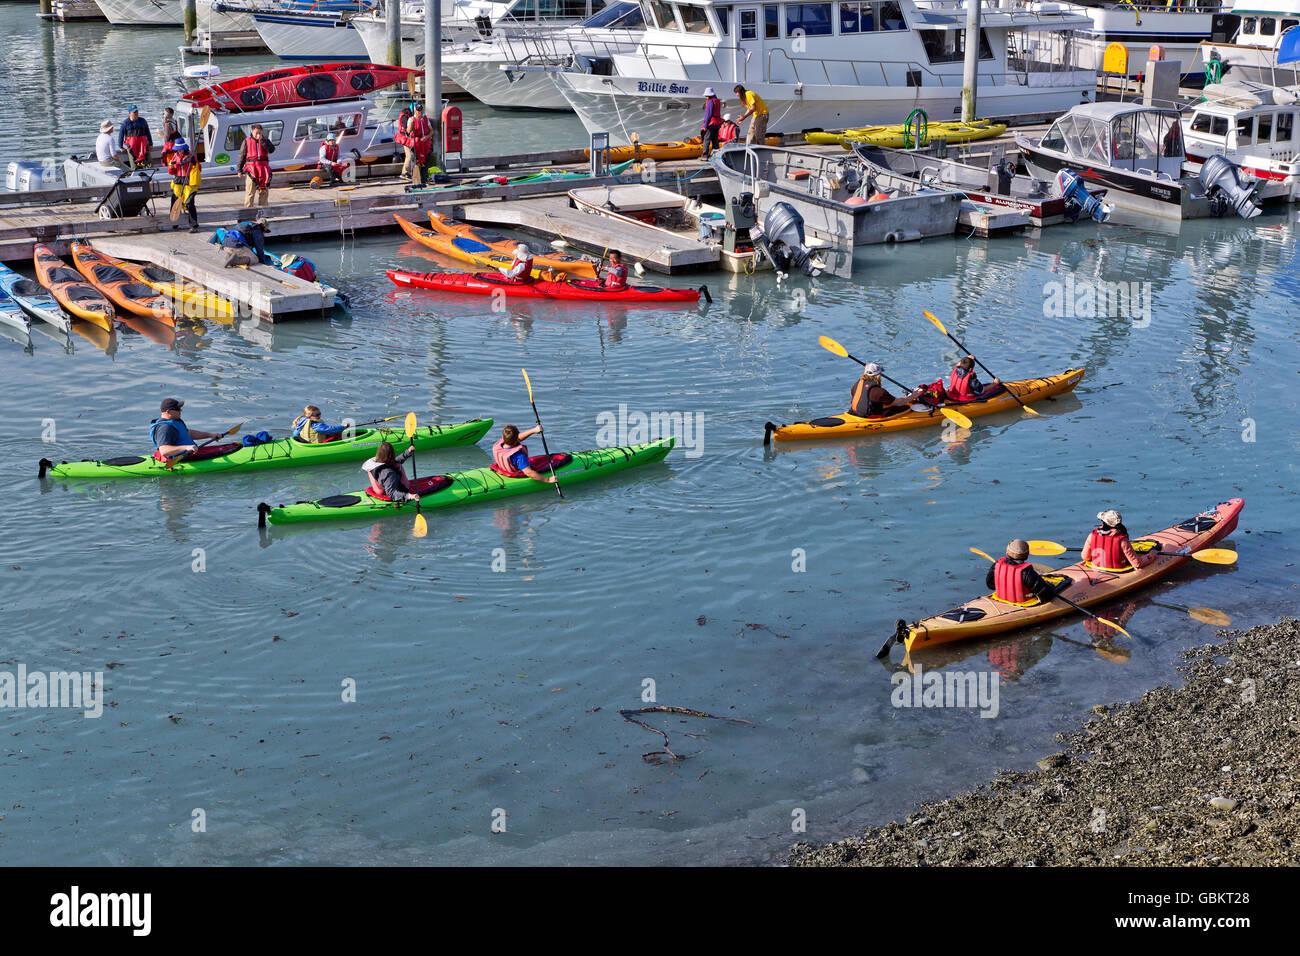 Kayakers, wearing safety gear departing Port of Valdez. - Stock Image